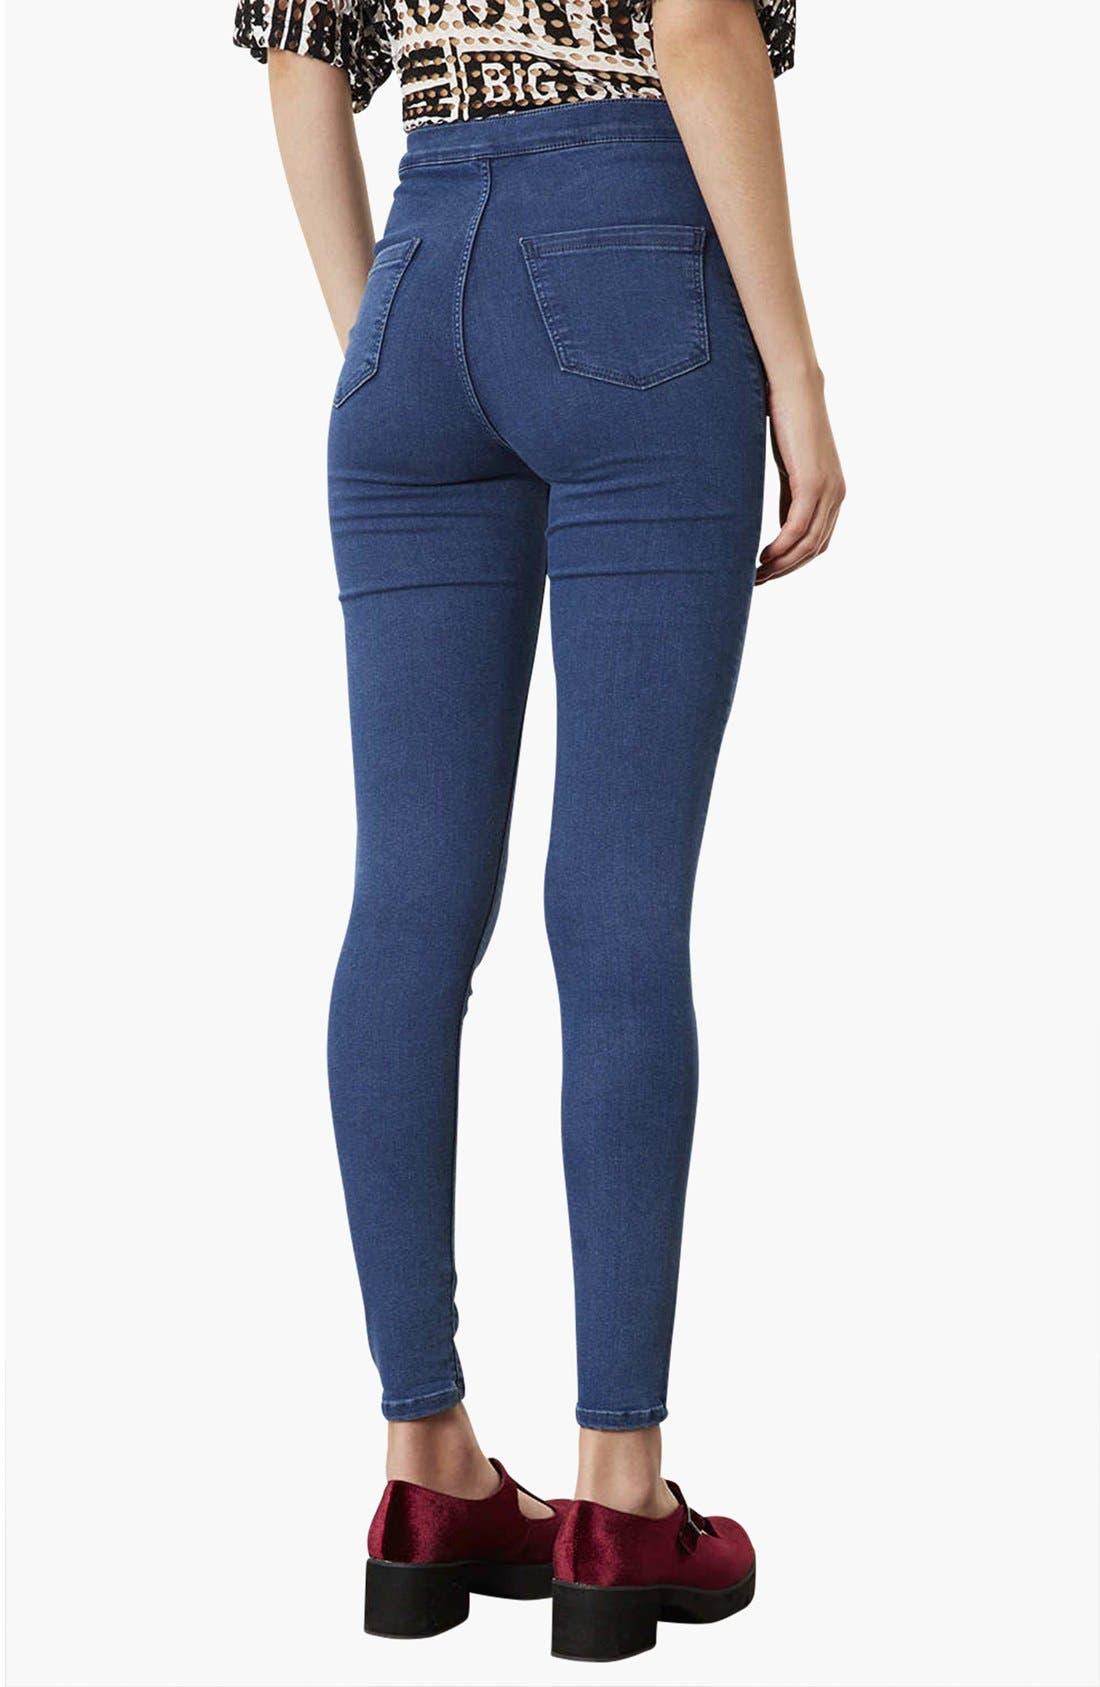 Alternate Image 2  - Topshop Moto 'Joni' High Rise Skinny Jeans (Dark Stone) (Regular, Short & Long)